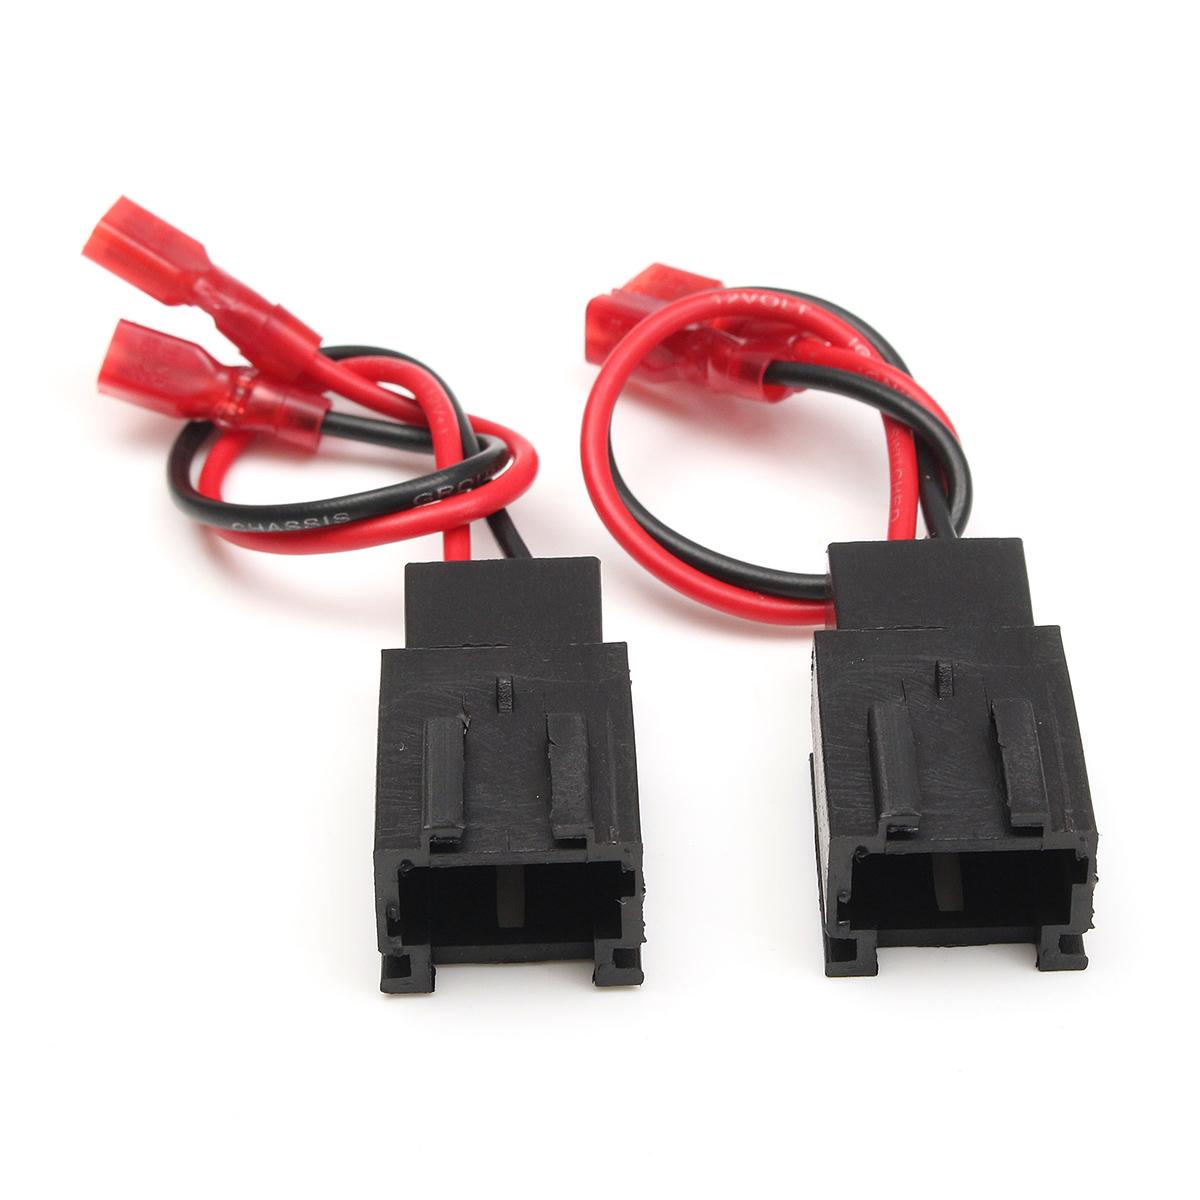 Peugeot 206 & Citroen Speaker Adaptor Lead Loom Connectors PC2-821 ...